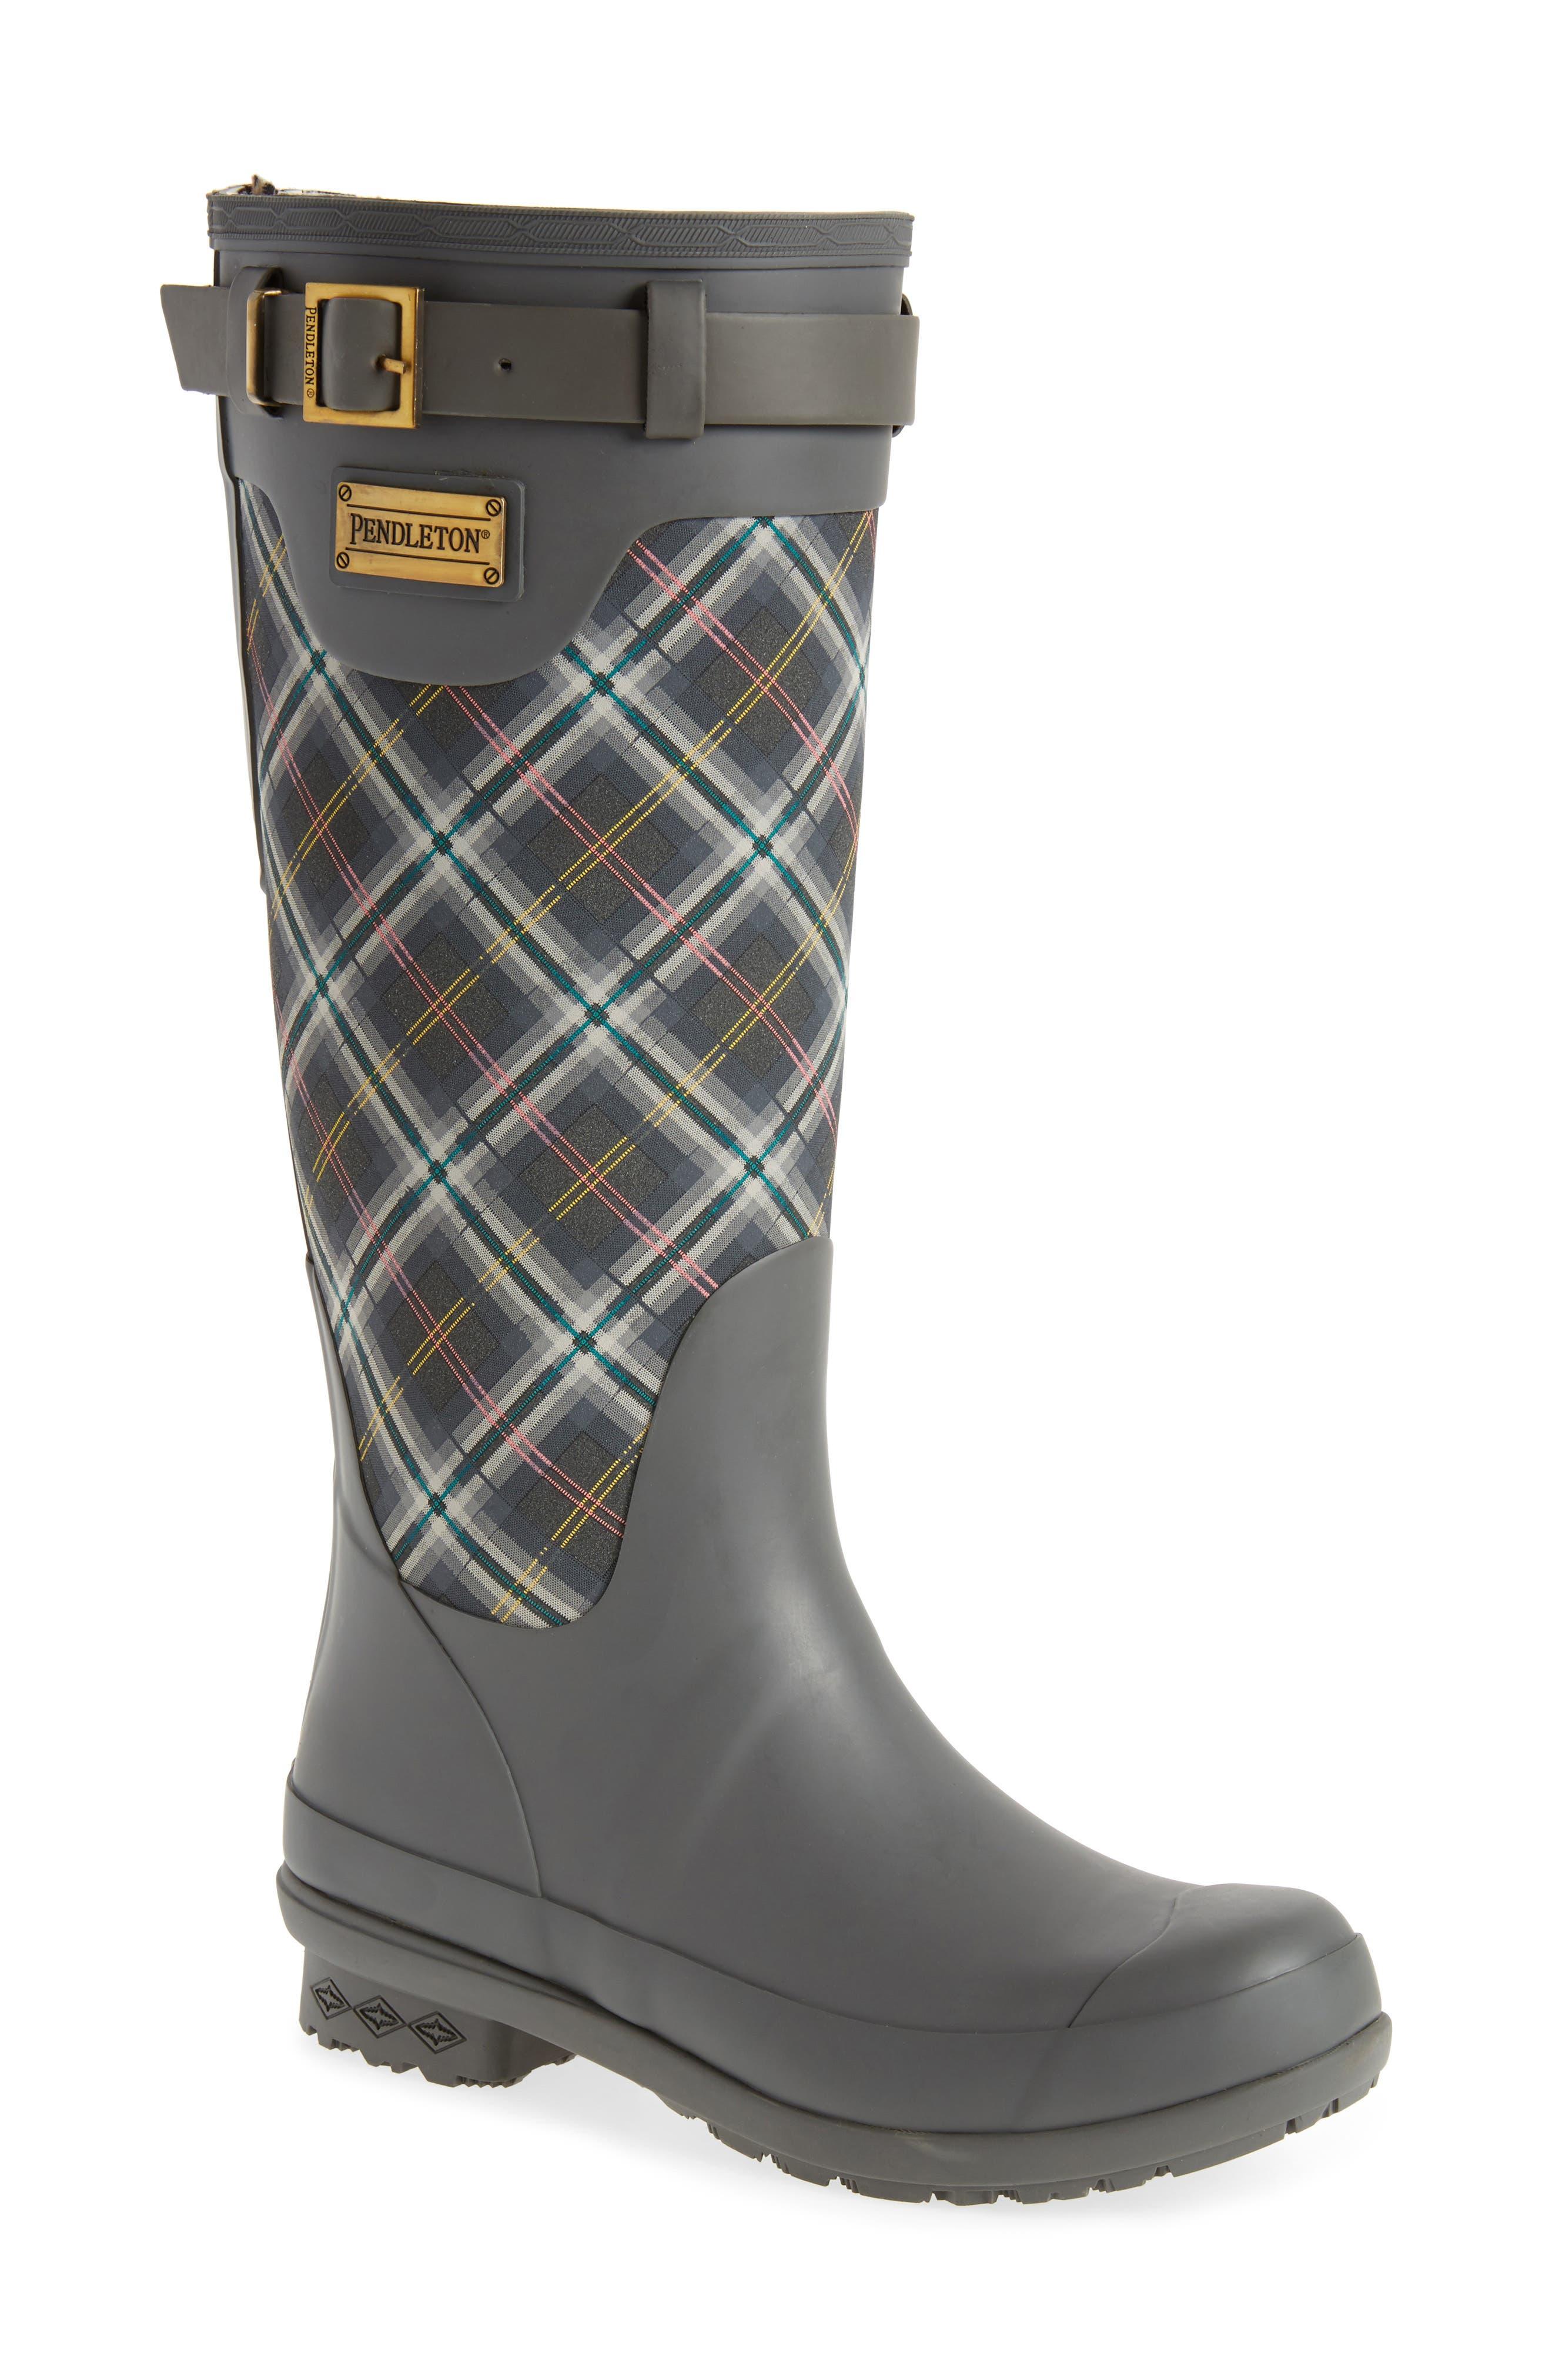 Alternate Image 1 Selected - Pendleton Oxford Rain Boot (Women)